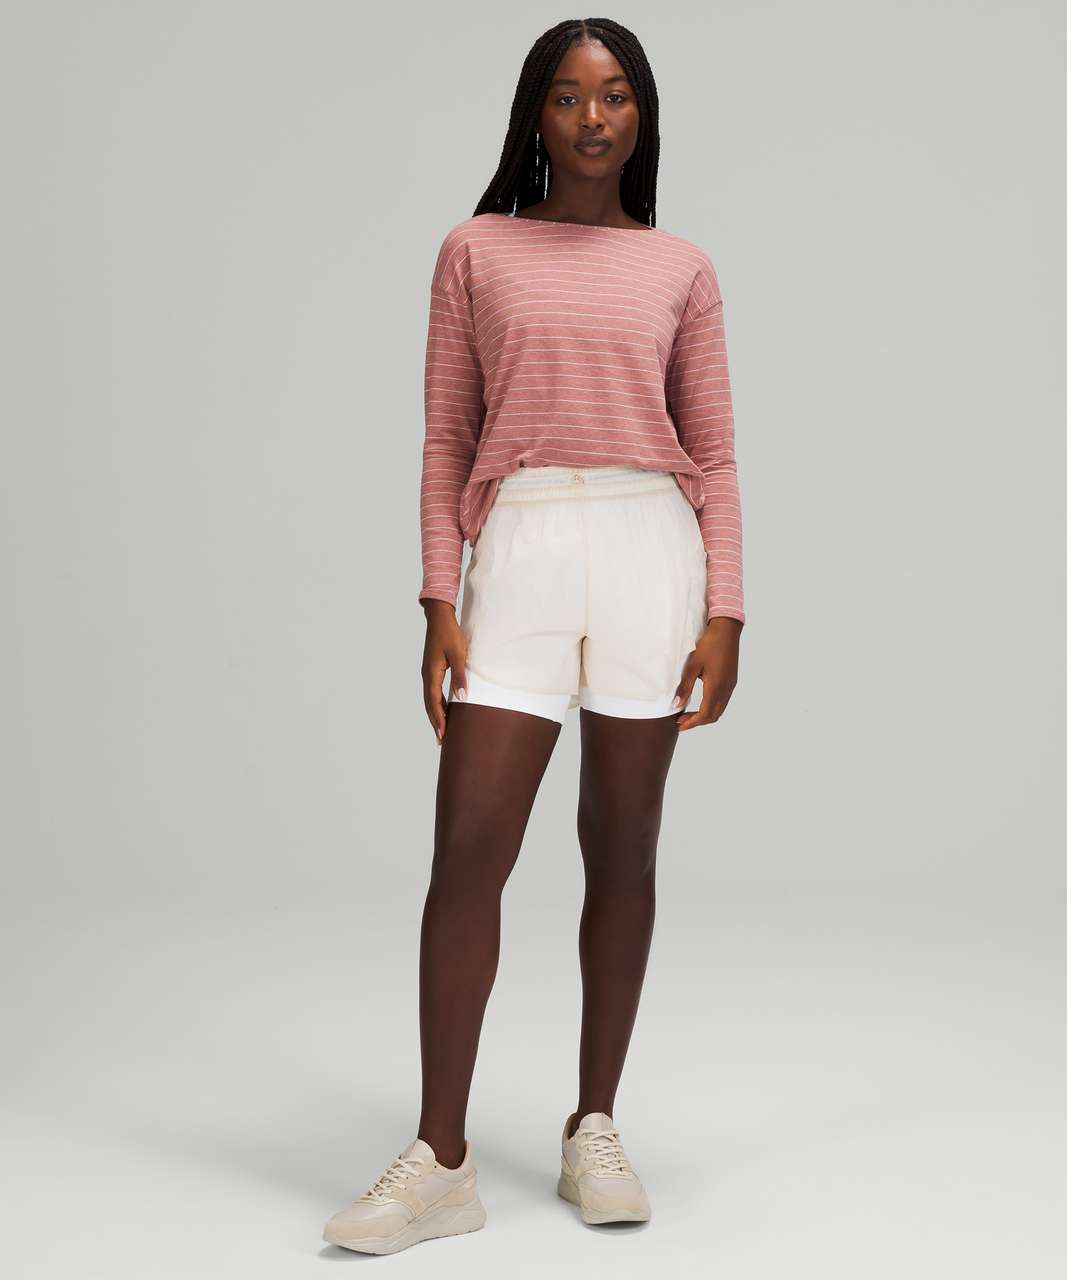 Lululemon Back In Action Long Sleeve - Short Serve Stripe Heathered Spiced Chai White